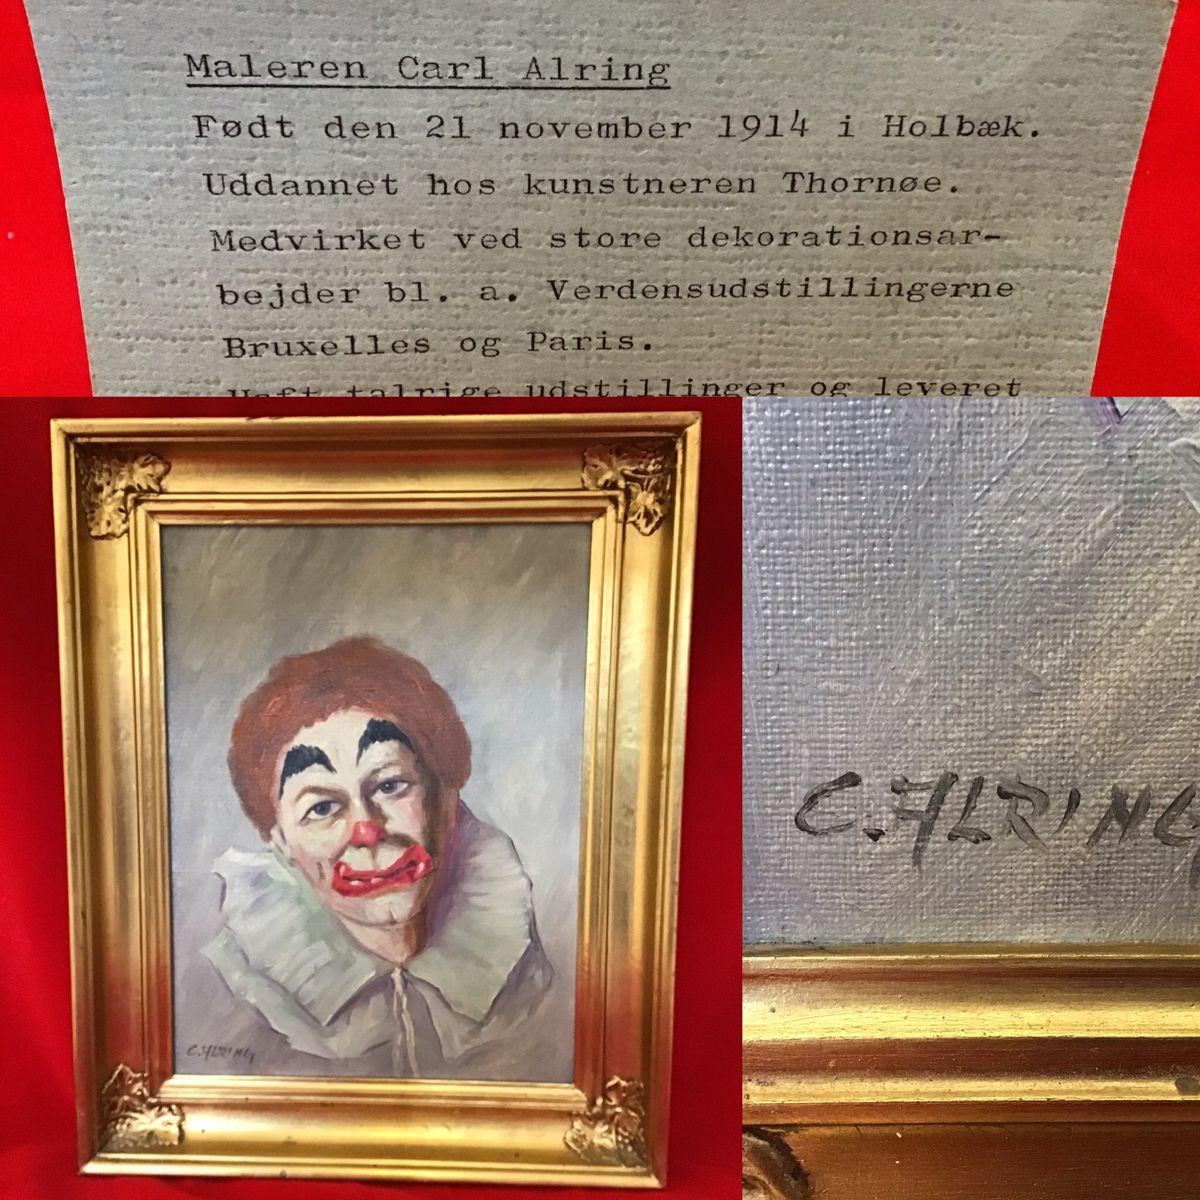 "Oliemaleri af maleren Carl Alring "" læs tekst"" ,rammemål: h 49,5 cm. b 39,5 cm. Pris 650kr #oliemaleri #klovn #antik #antikviteter #retro #retroguld #retrofund #carlalring #genbrugsguld"